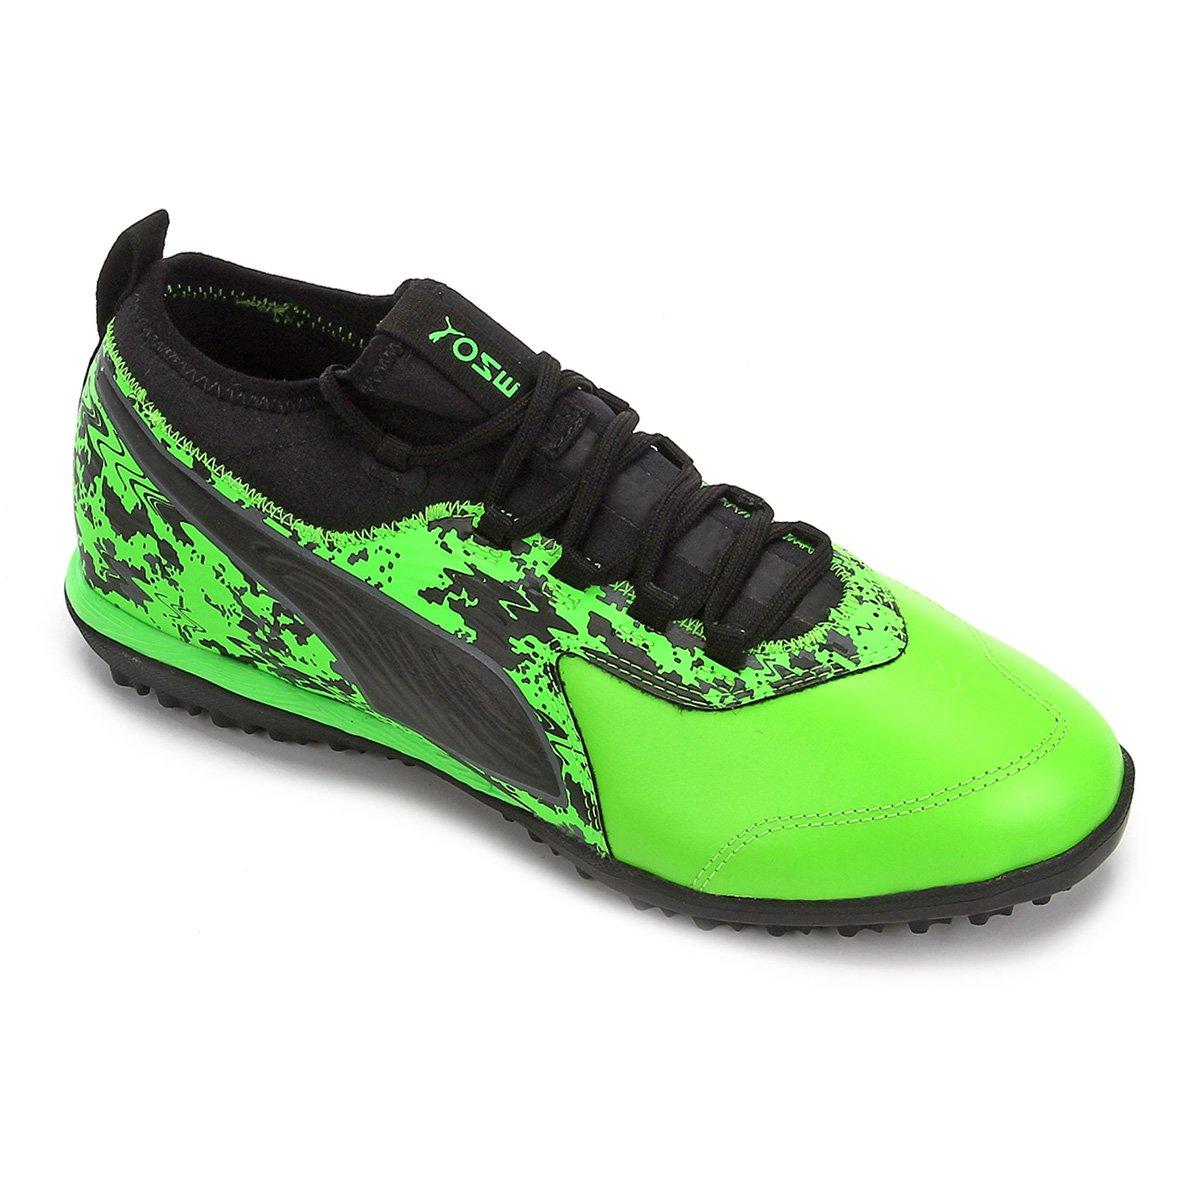 d0bcf6f091303 FornecedorNetshoes. Chuteira Society Puma One 19.3 TT